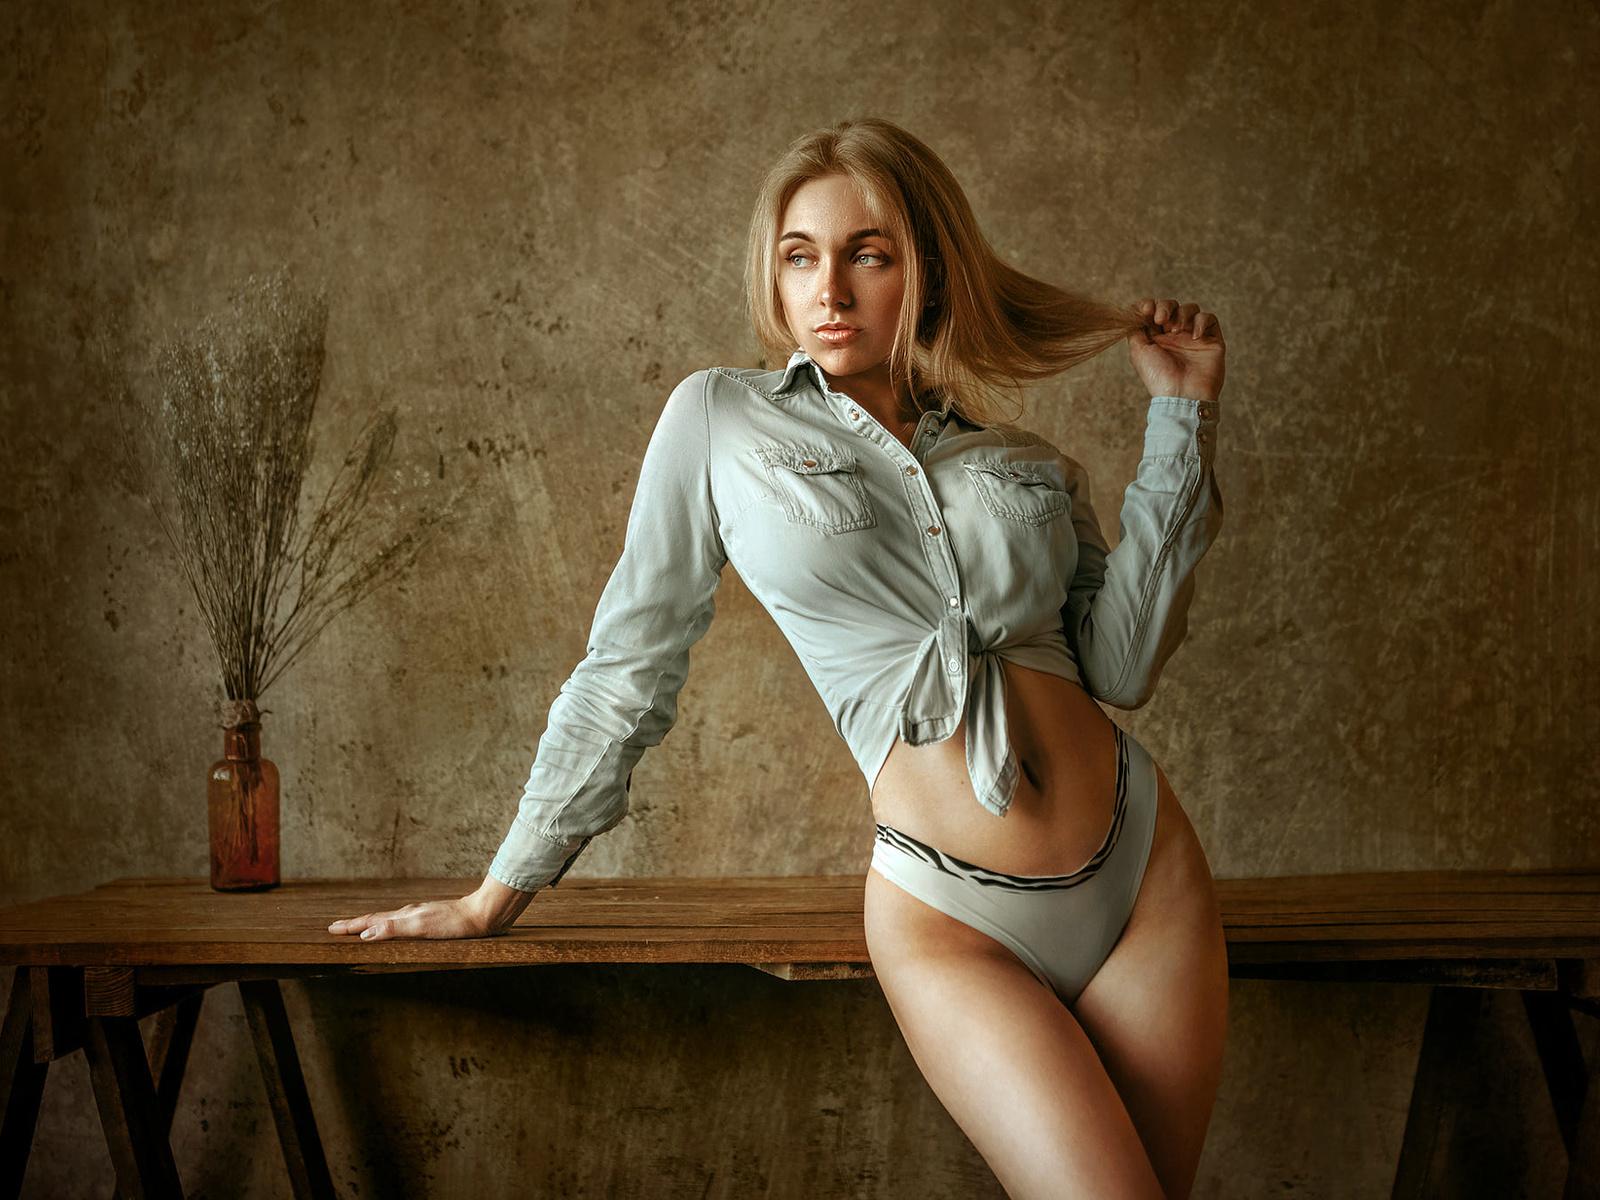 women, blonde, panties, table, belly, brunette, women indoors, wall, shirt, hands in hair, альберт лесной,albert lesnoy